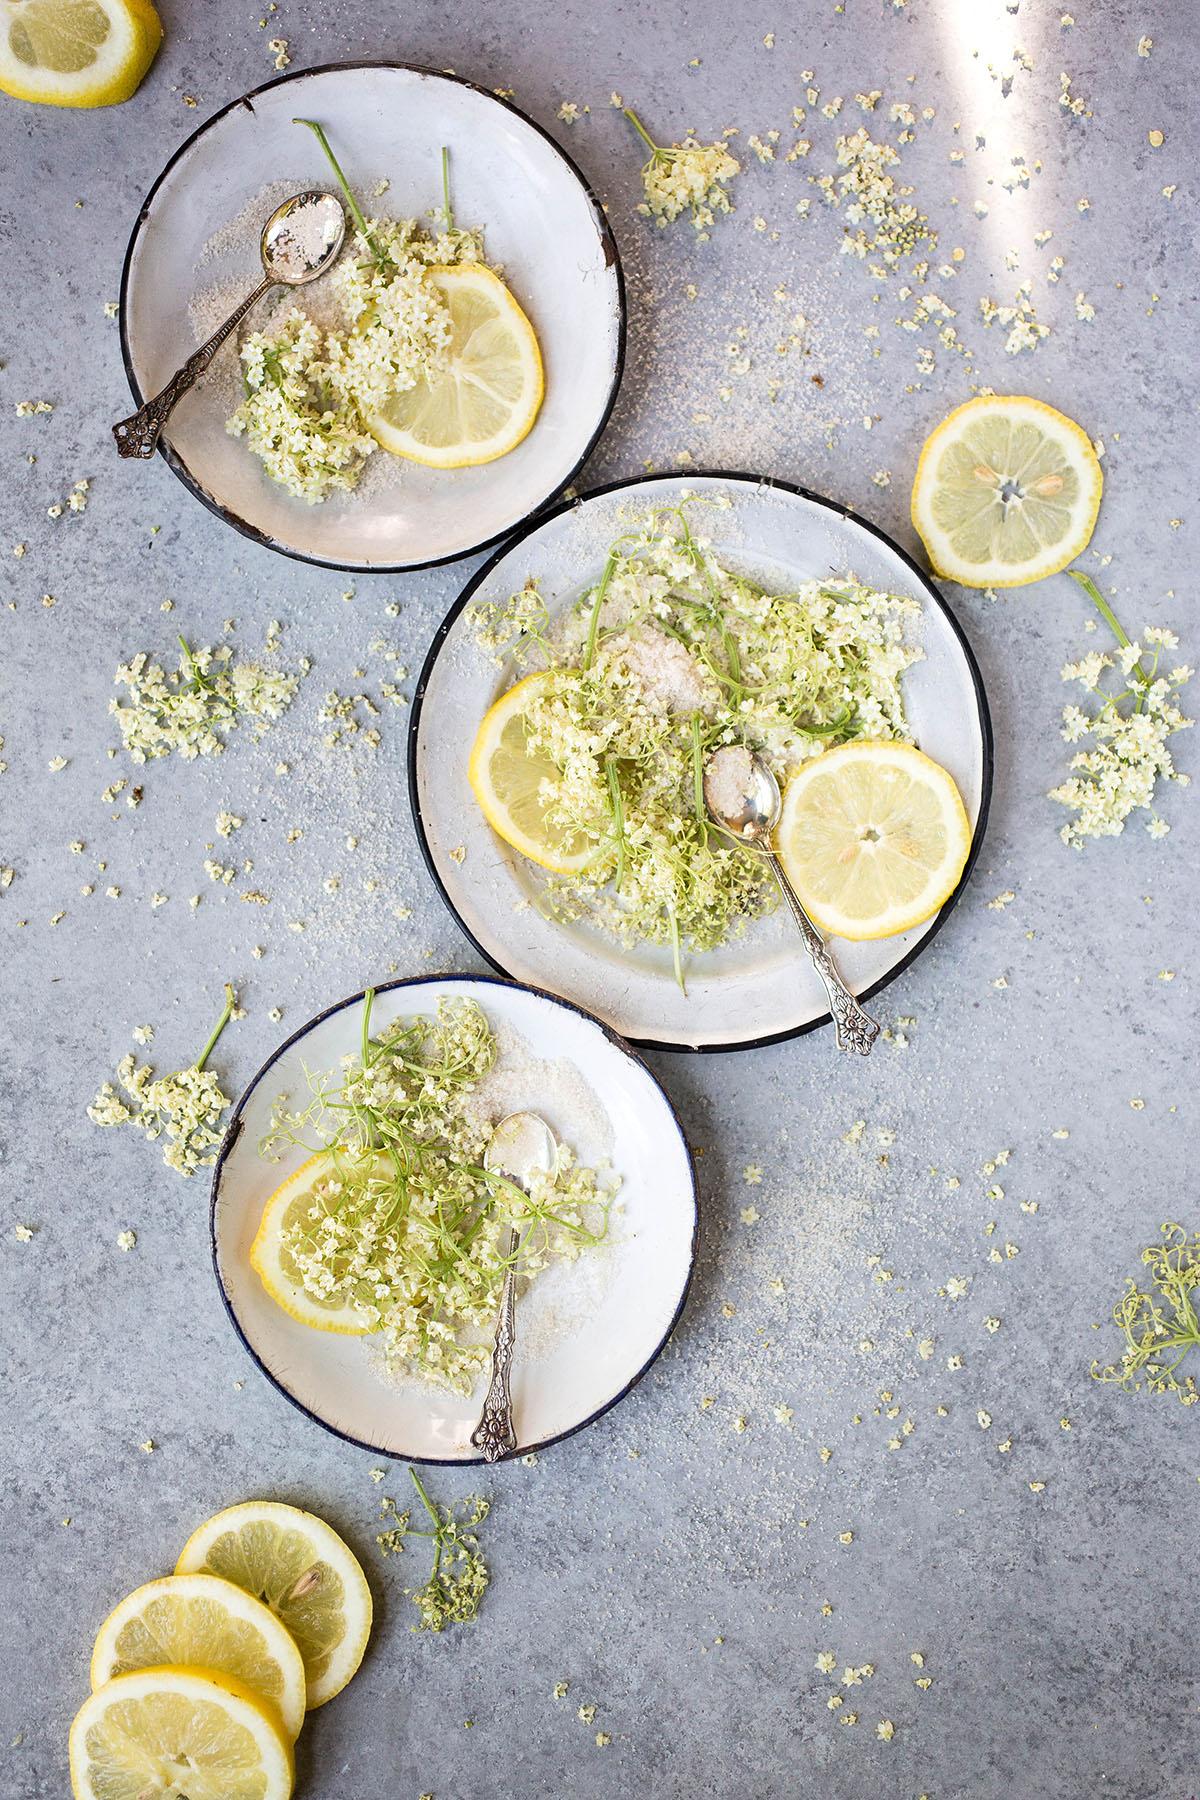 three plates of sugar, elderflower blossoms, and lemon slices